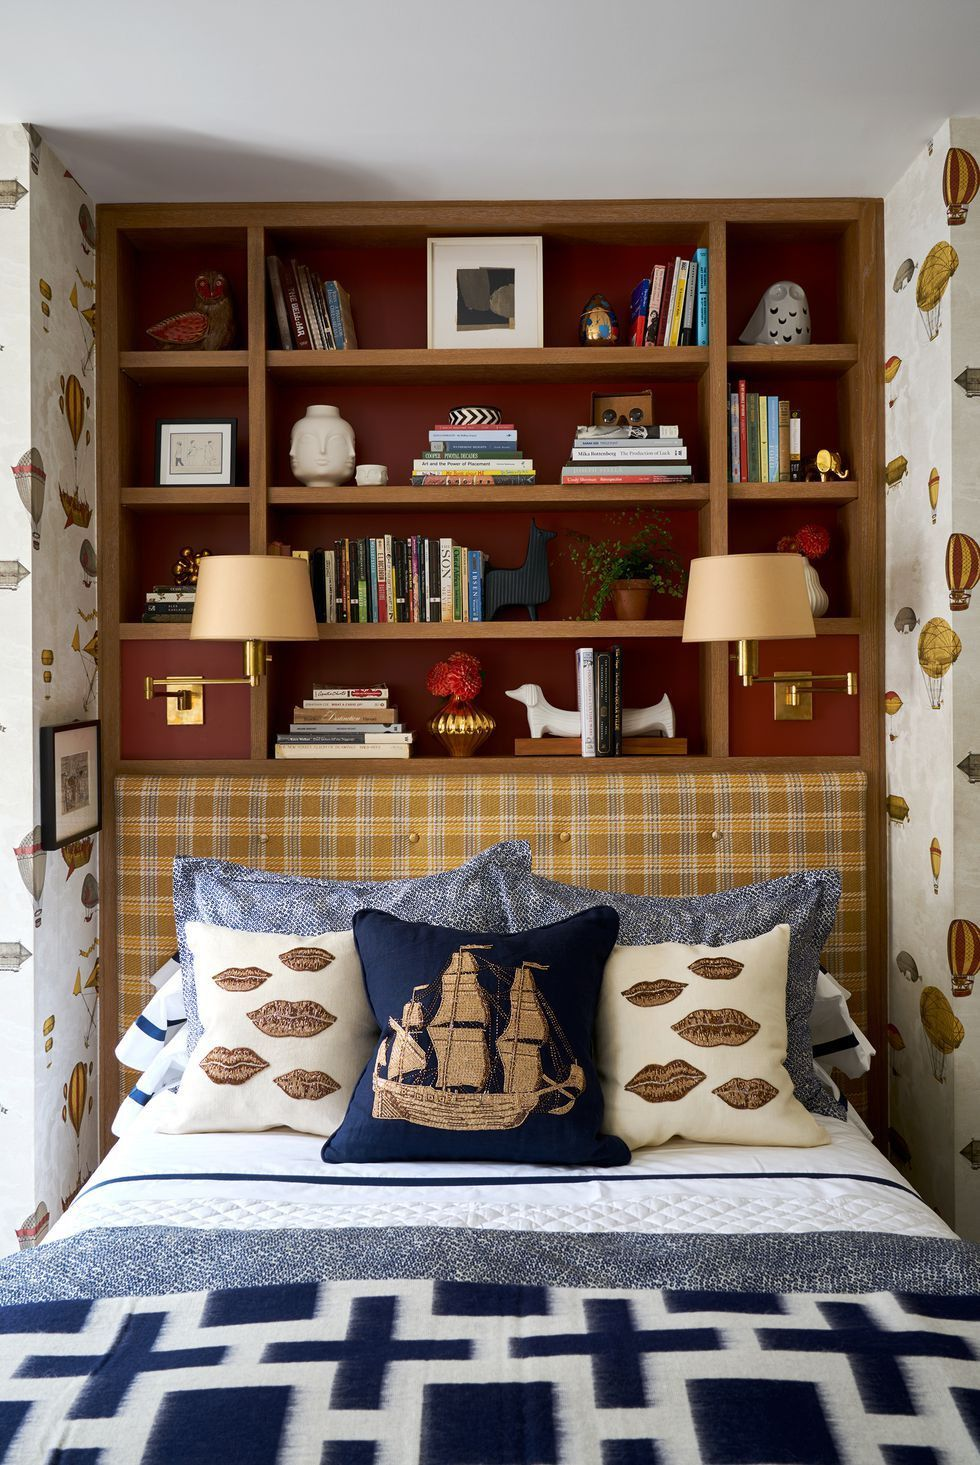 Small Room Interior Design 2021 in 2020 | Apartment ...